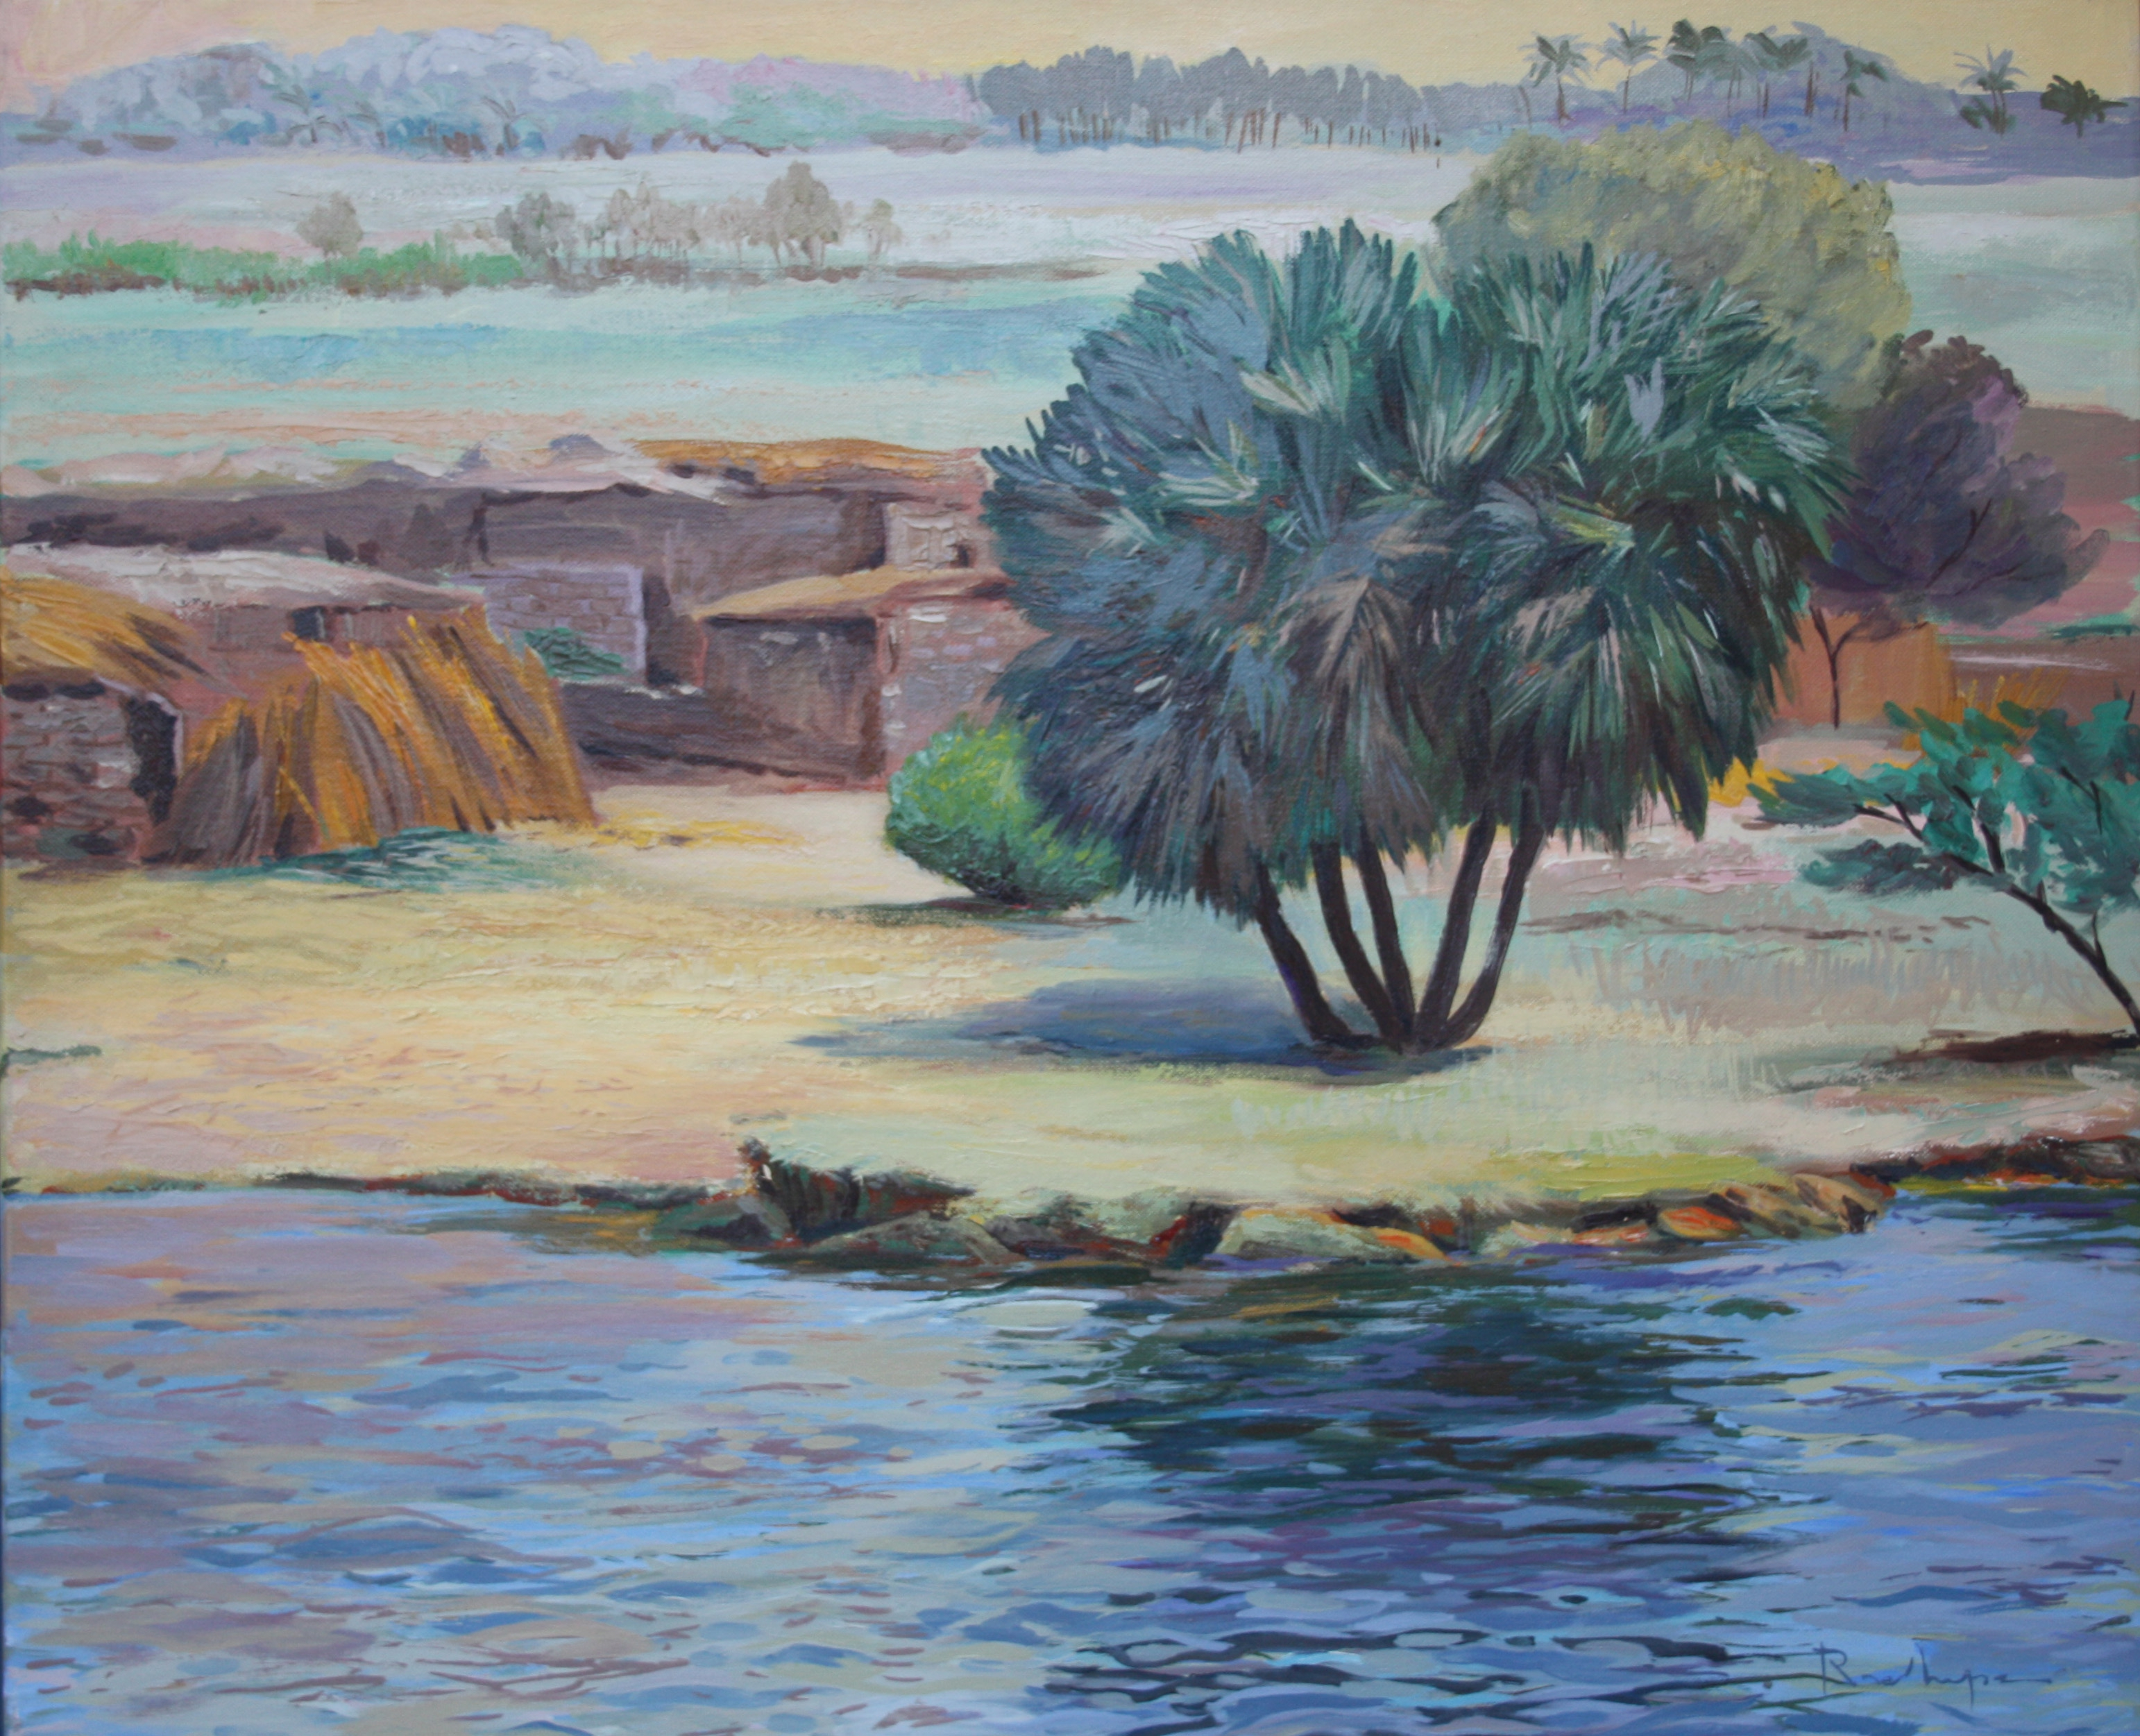 Between the Nil i the desert